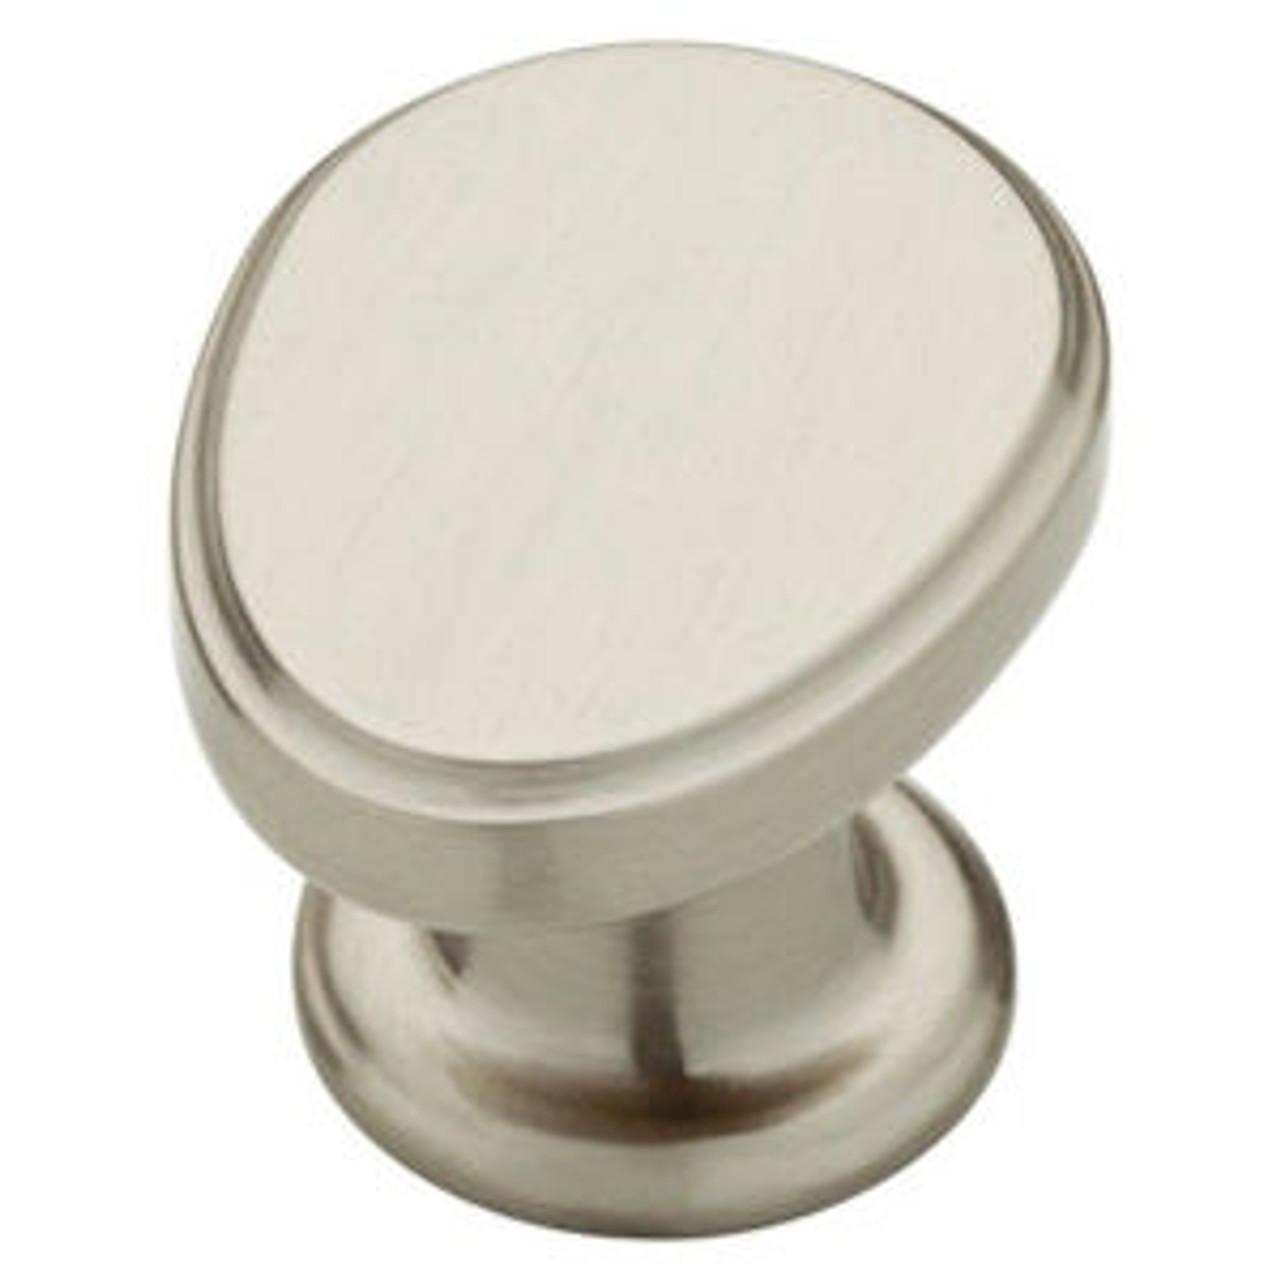 "085-03-0041  1 1/4"" Serenity Satin Nickel Cabinet Drawer Pull Knob 10 Pack"